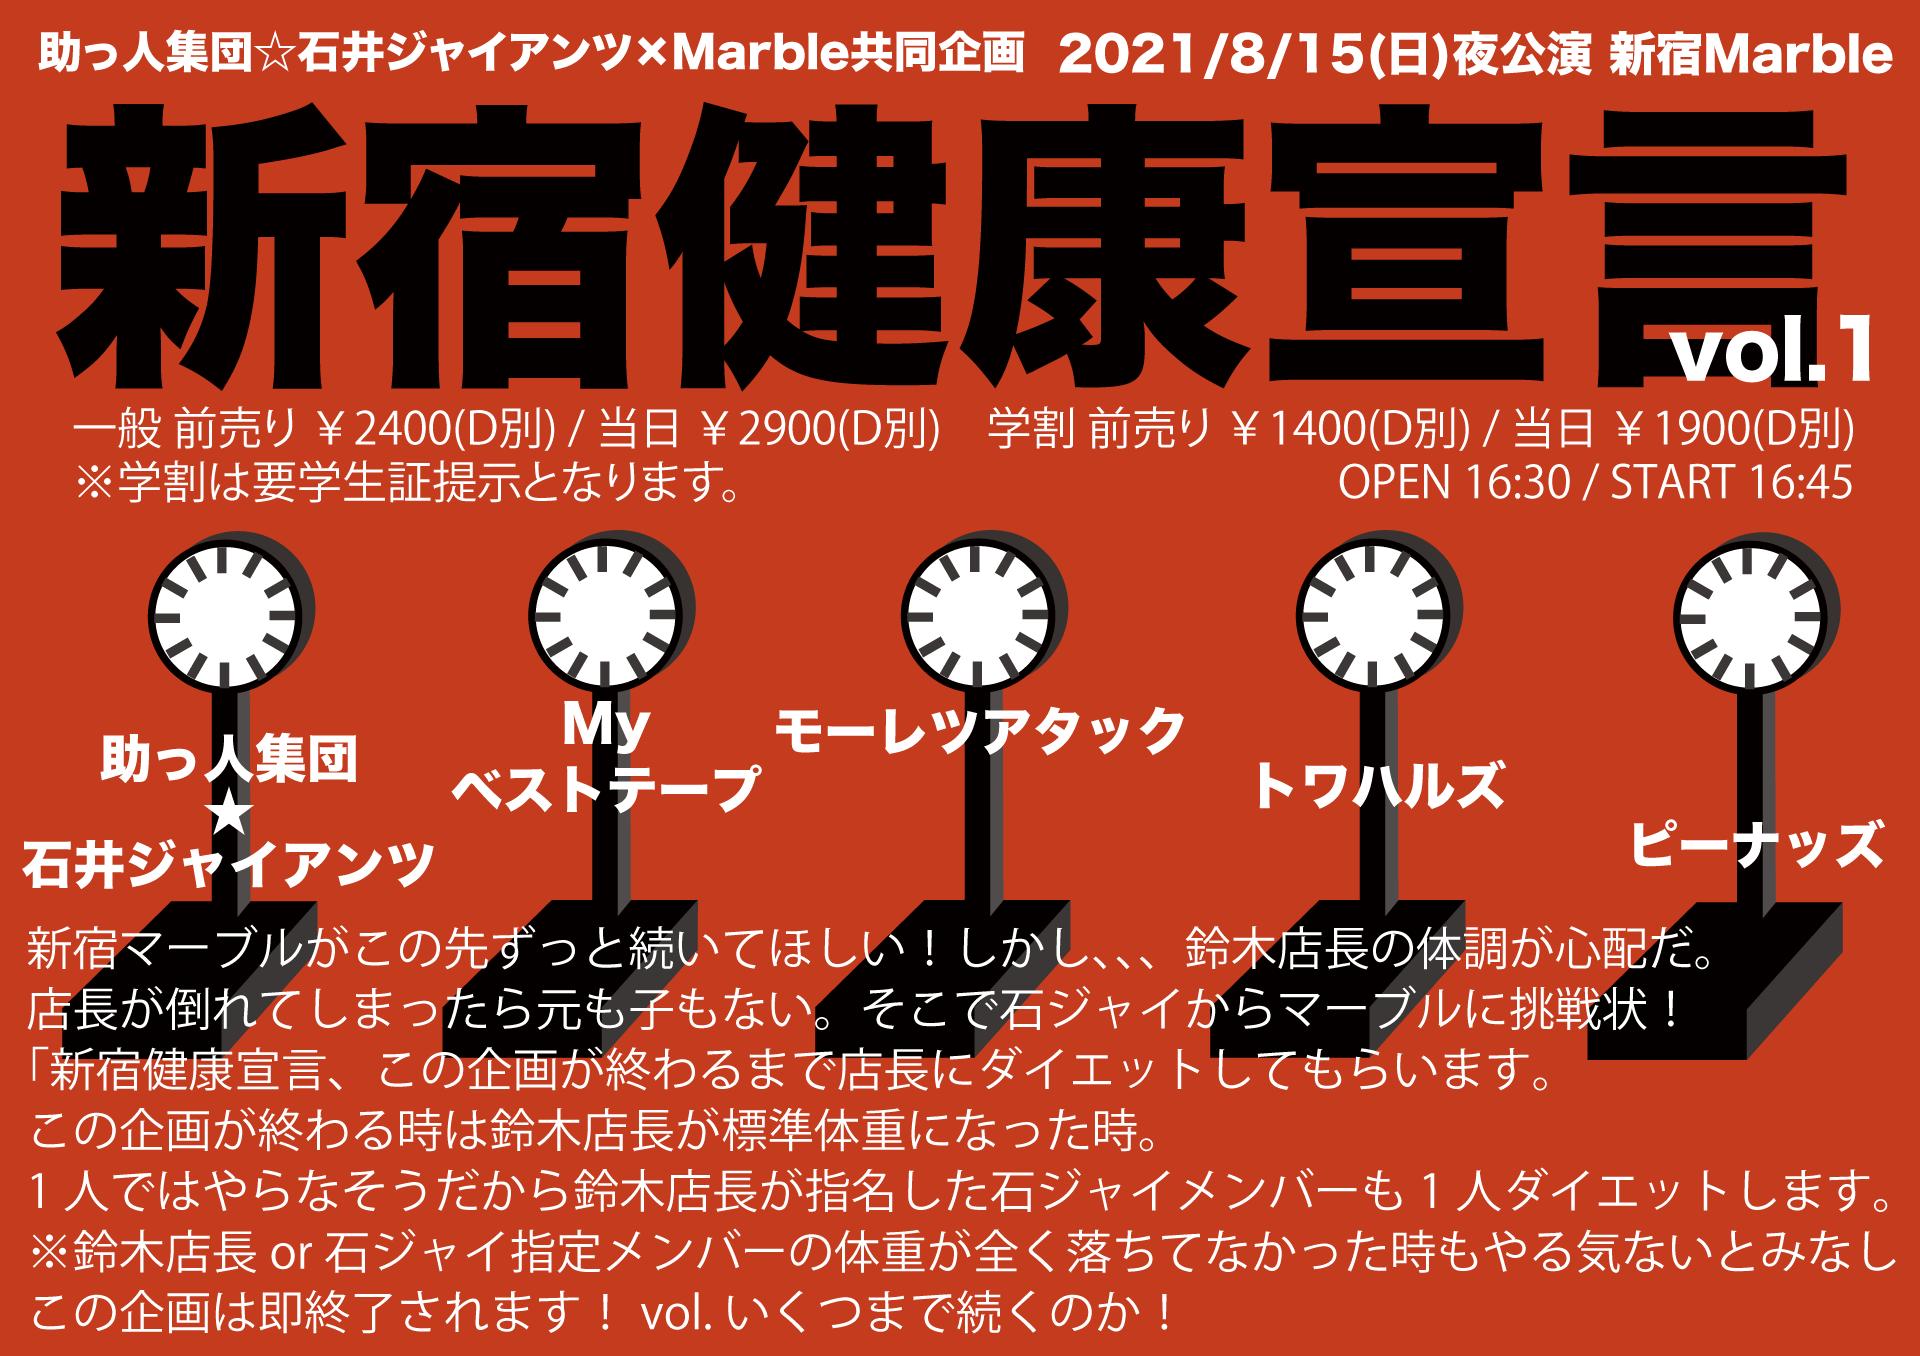 石ジャイ×Marble共同企画 「新宿健康宣言 vol.1」